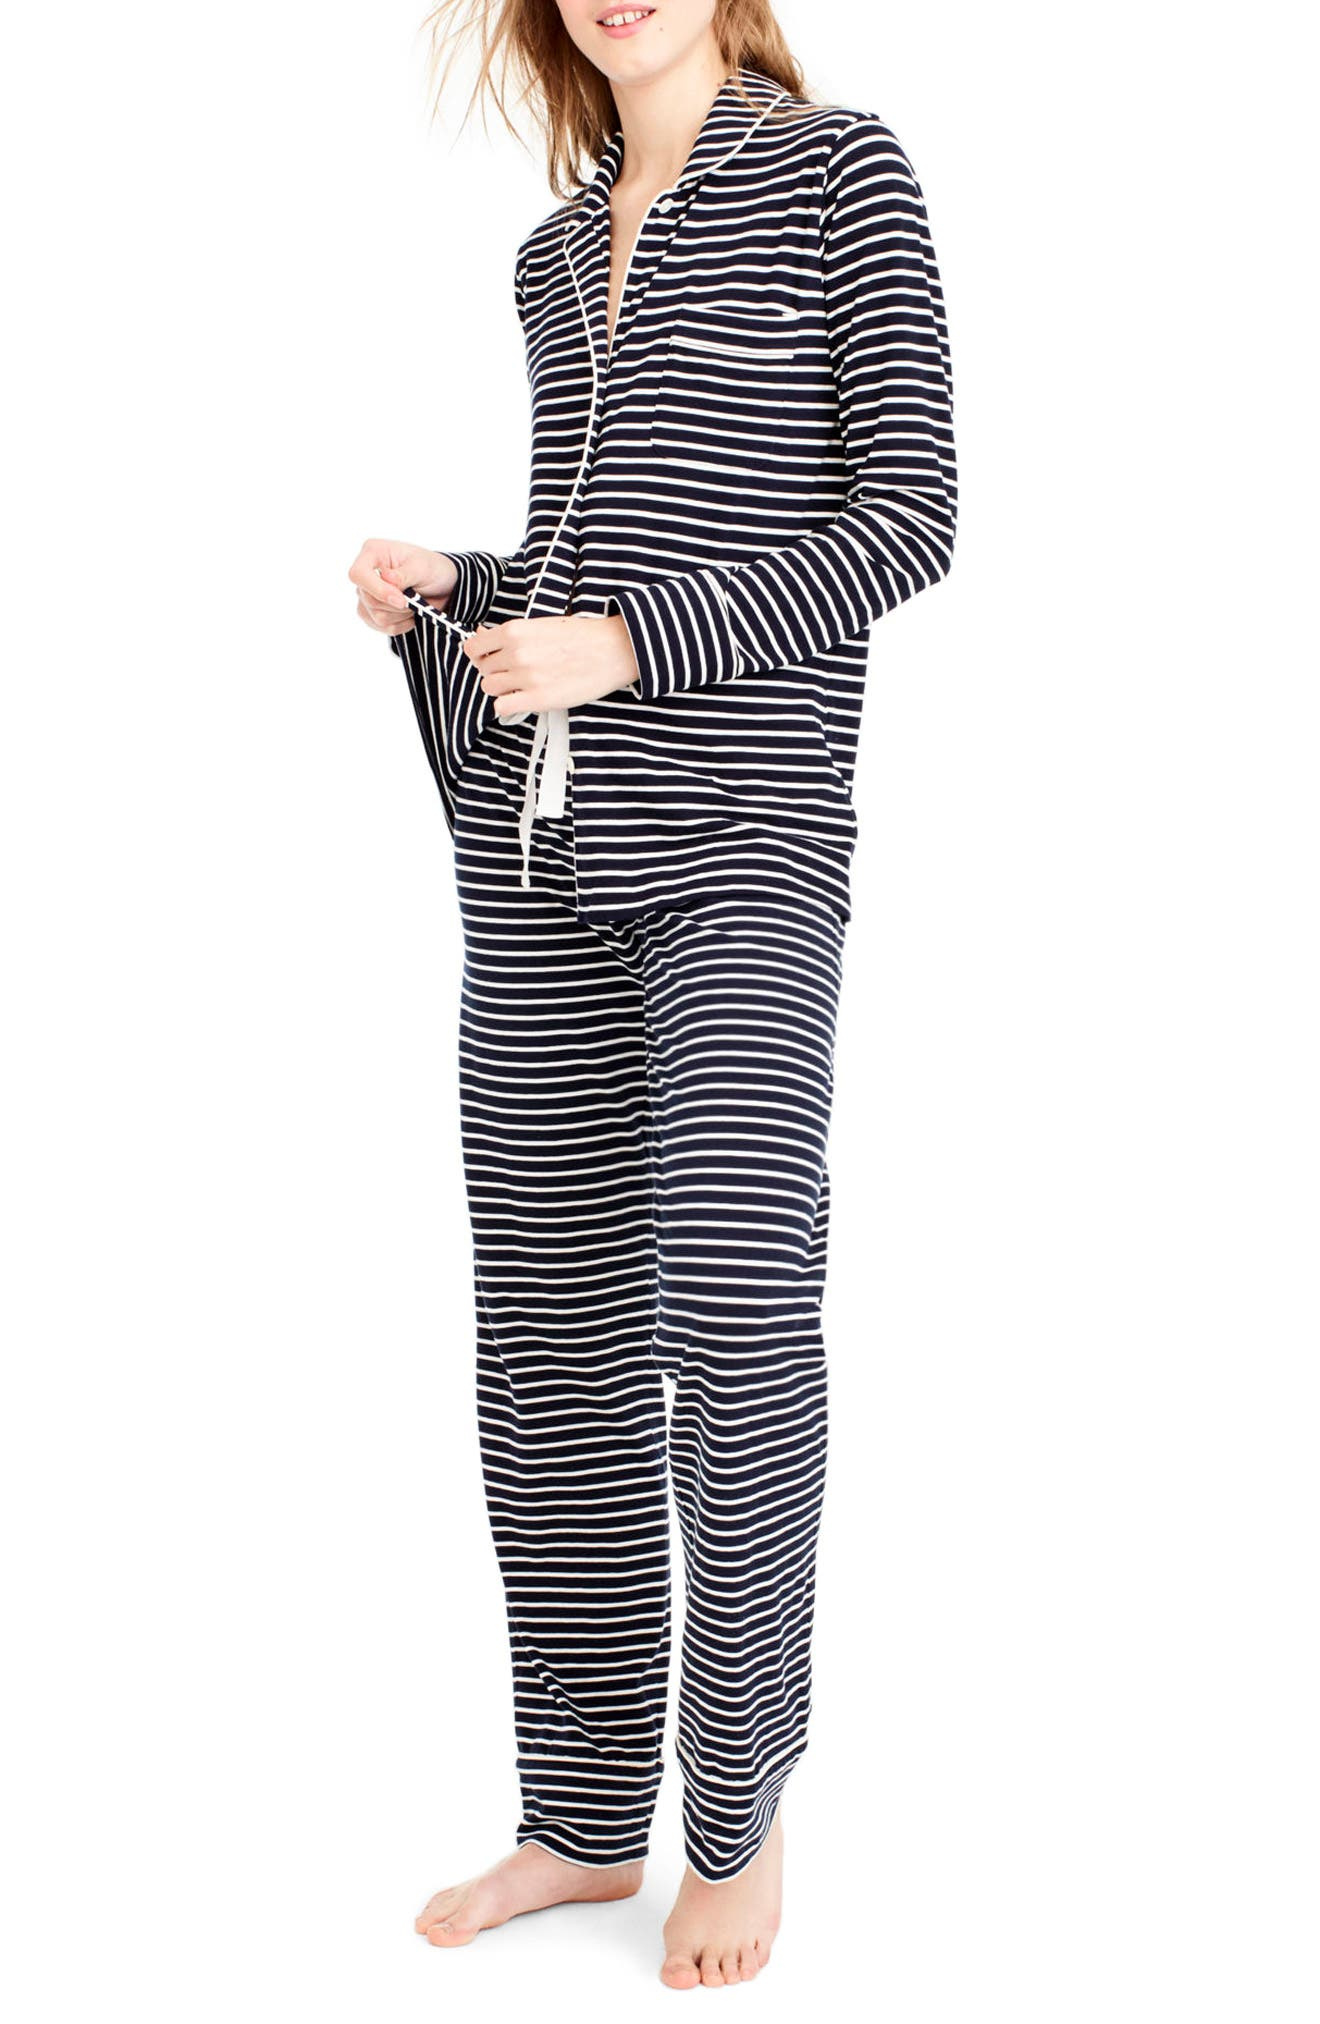 Dreamy Stripe Cotton Pajamas,                             Main thumbnail 1, color,                             NAVY IVORY